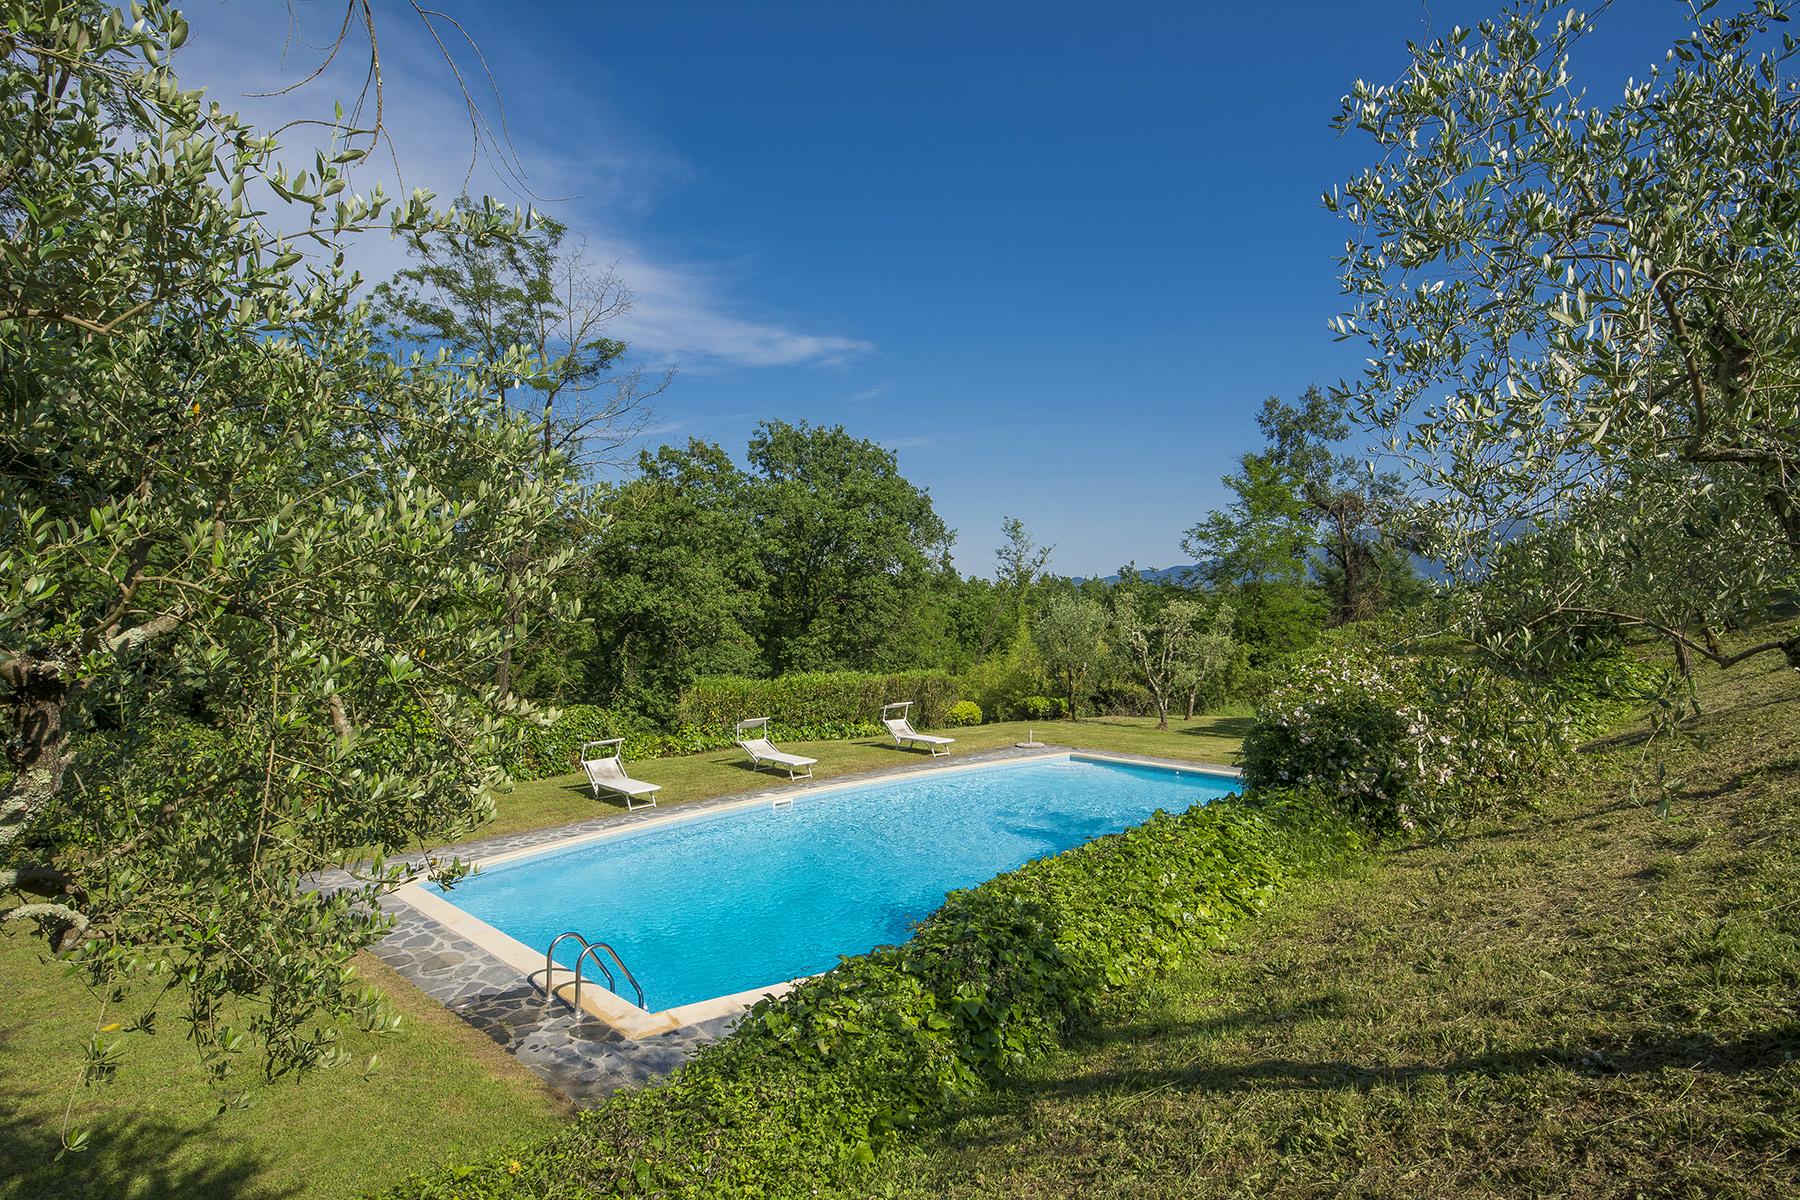 Villa in Vendita a Lucca: 5 locali, 600 mq - Foto 4